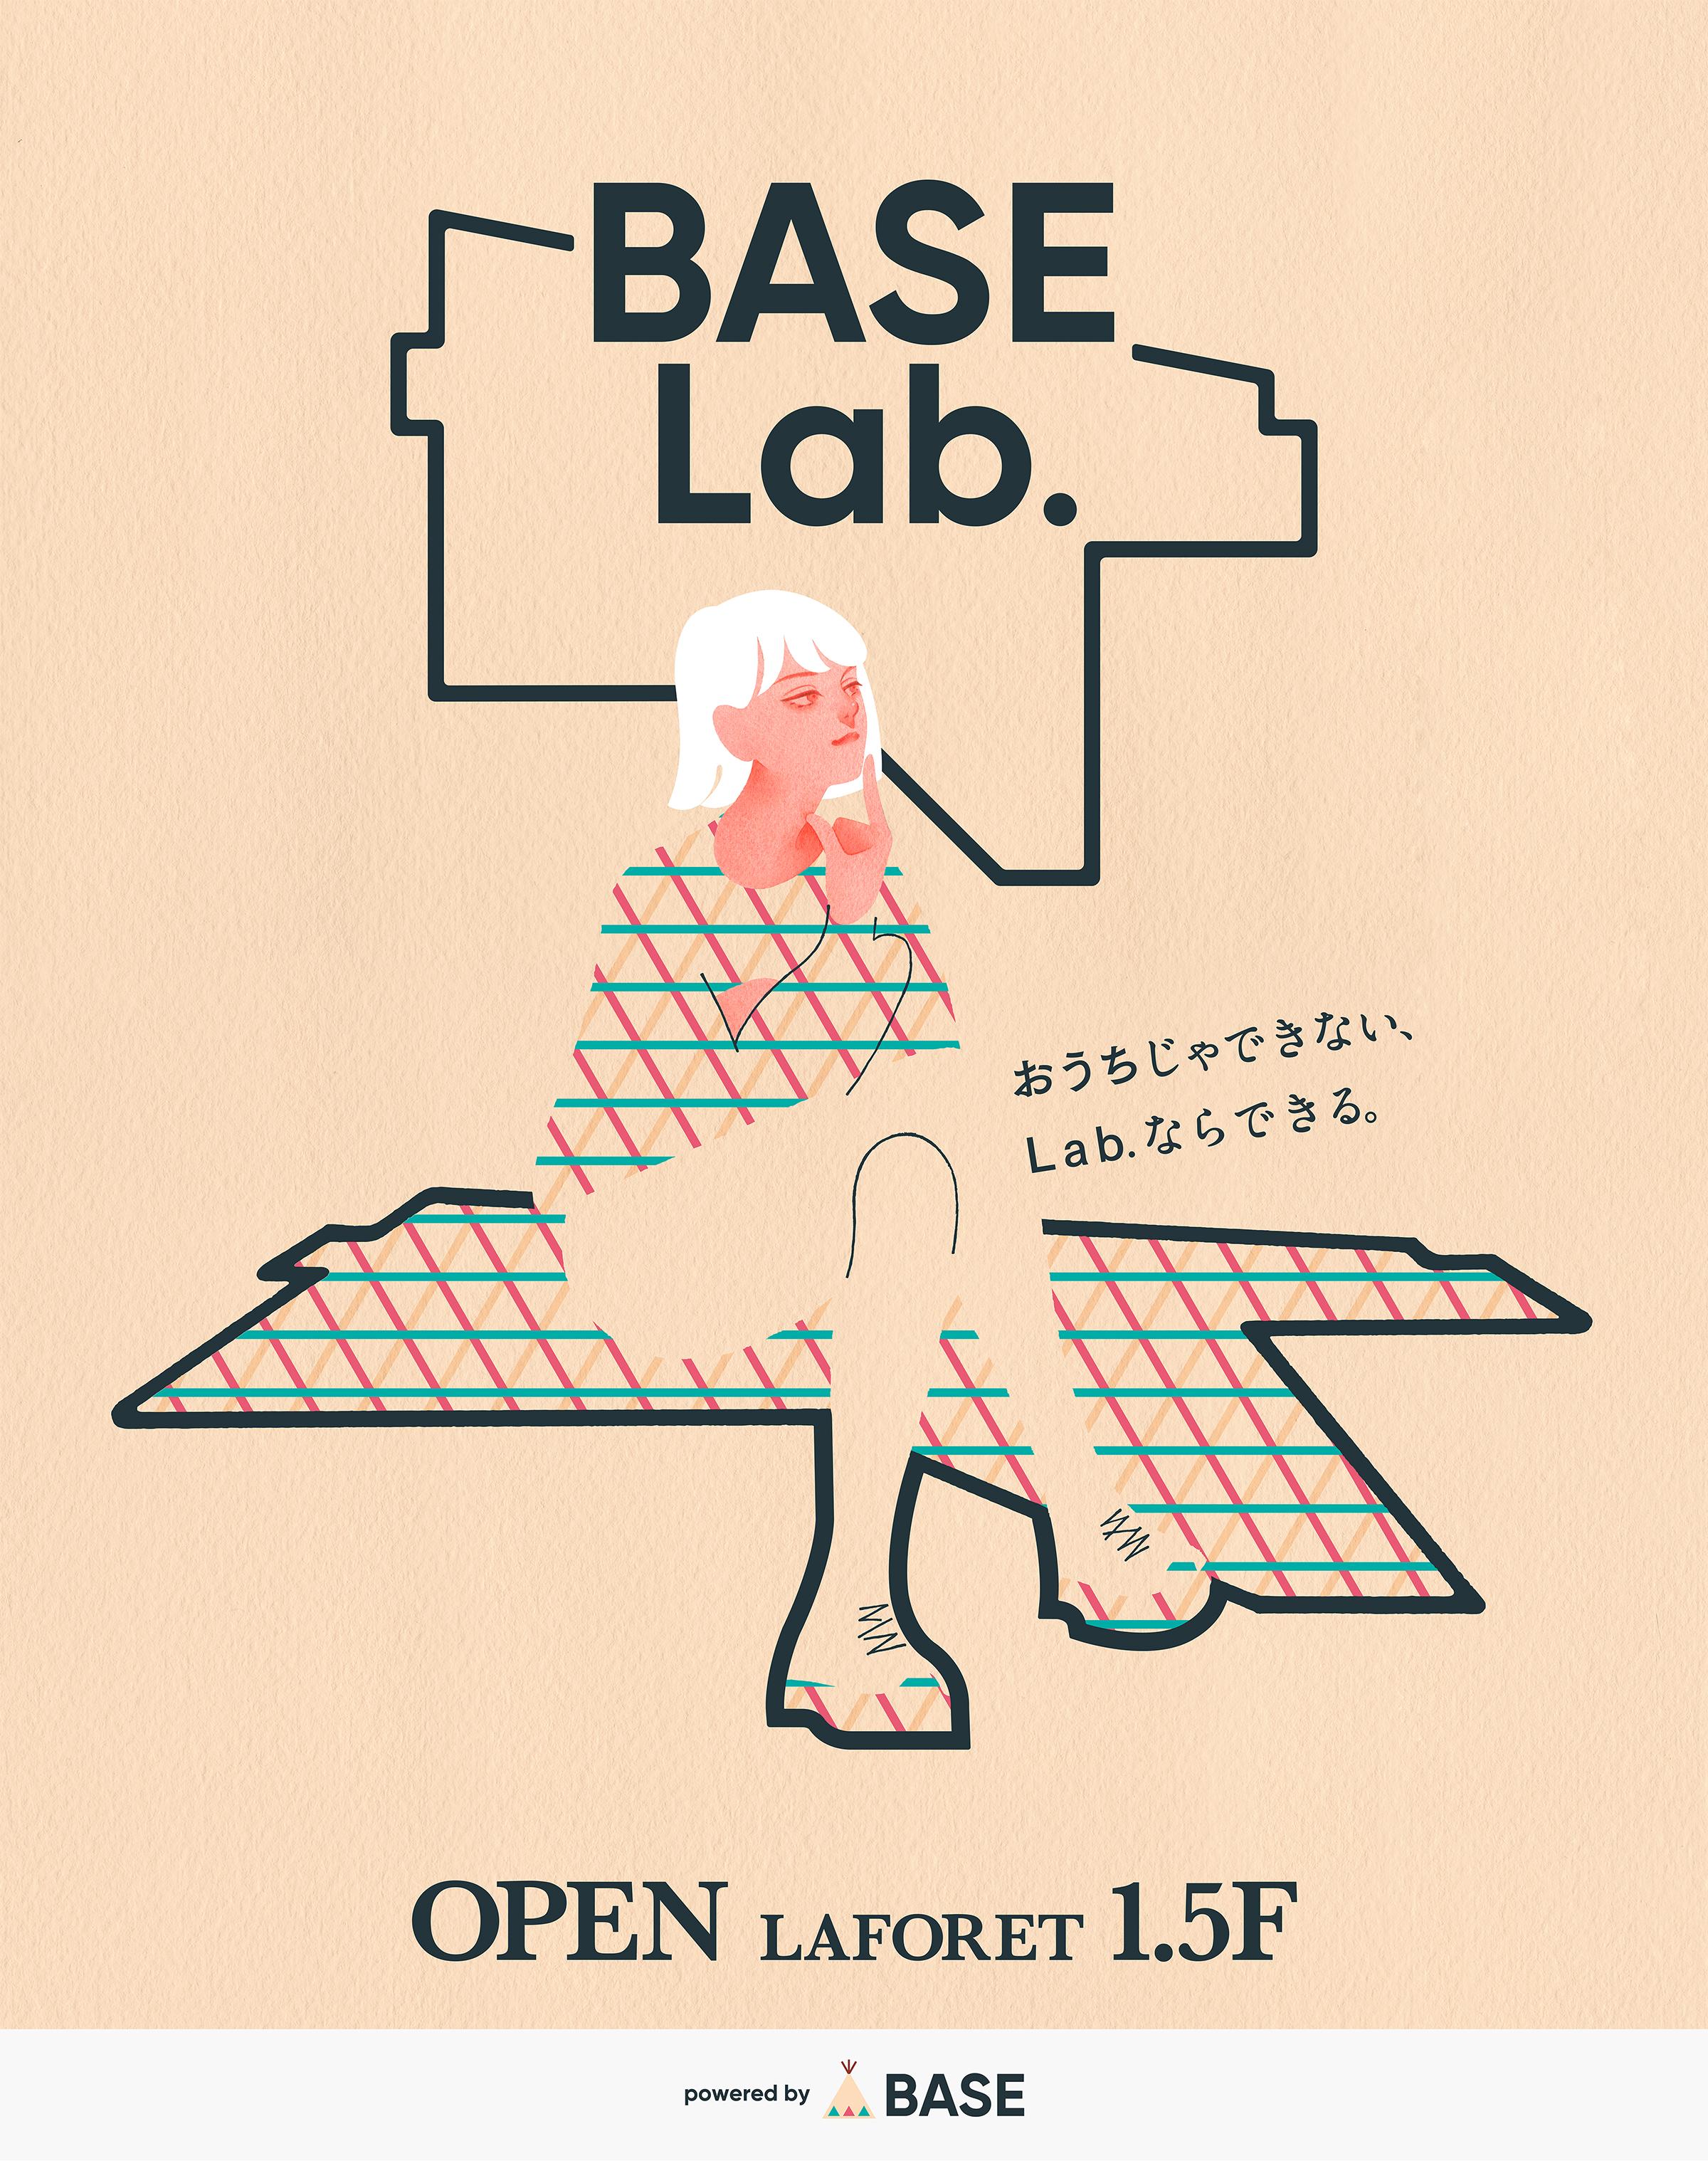 BASE Lab.